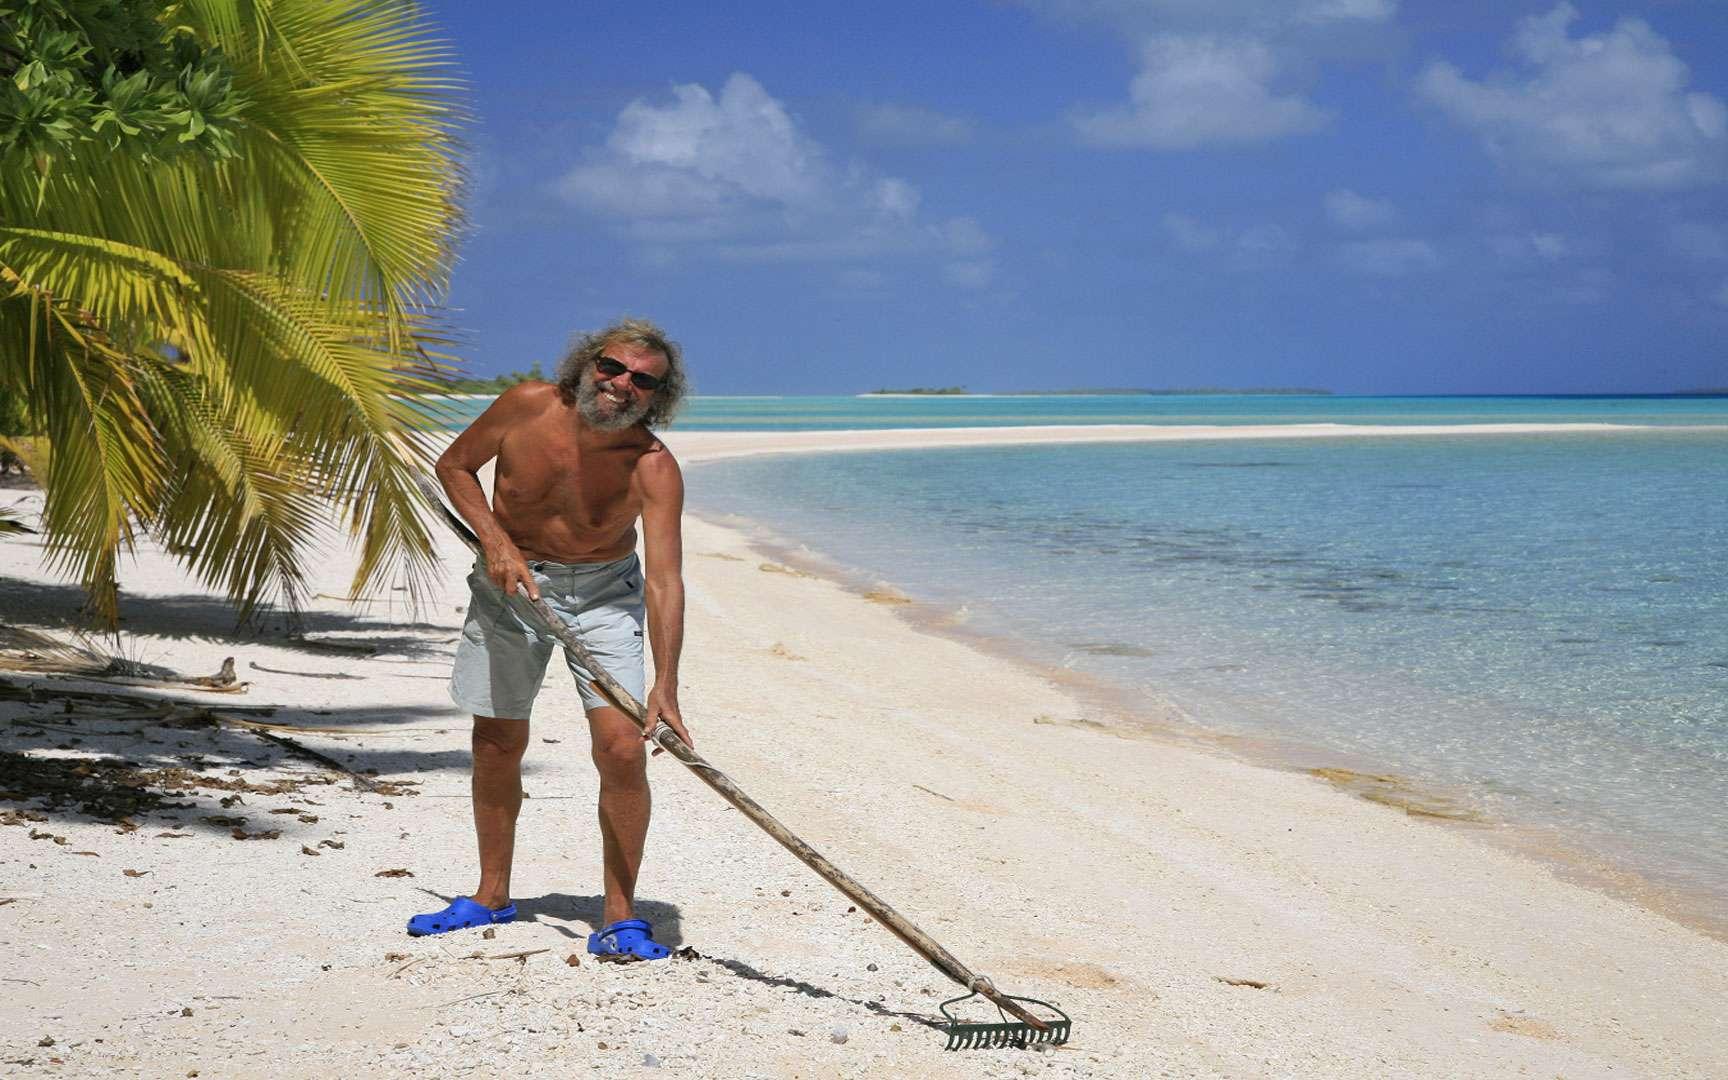 Antoine au travail dans l'archipel des Tuamotu. Les principaux atolls sont Anaa, Manihi, Rangiroa, Fakarava, Hao, Makemo, Tikehau et Mataiva. © Antoine